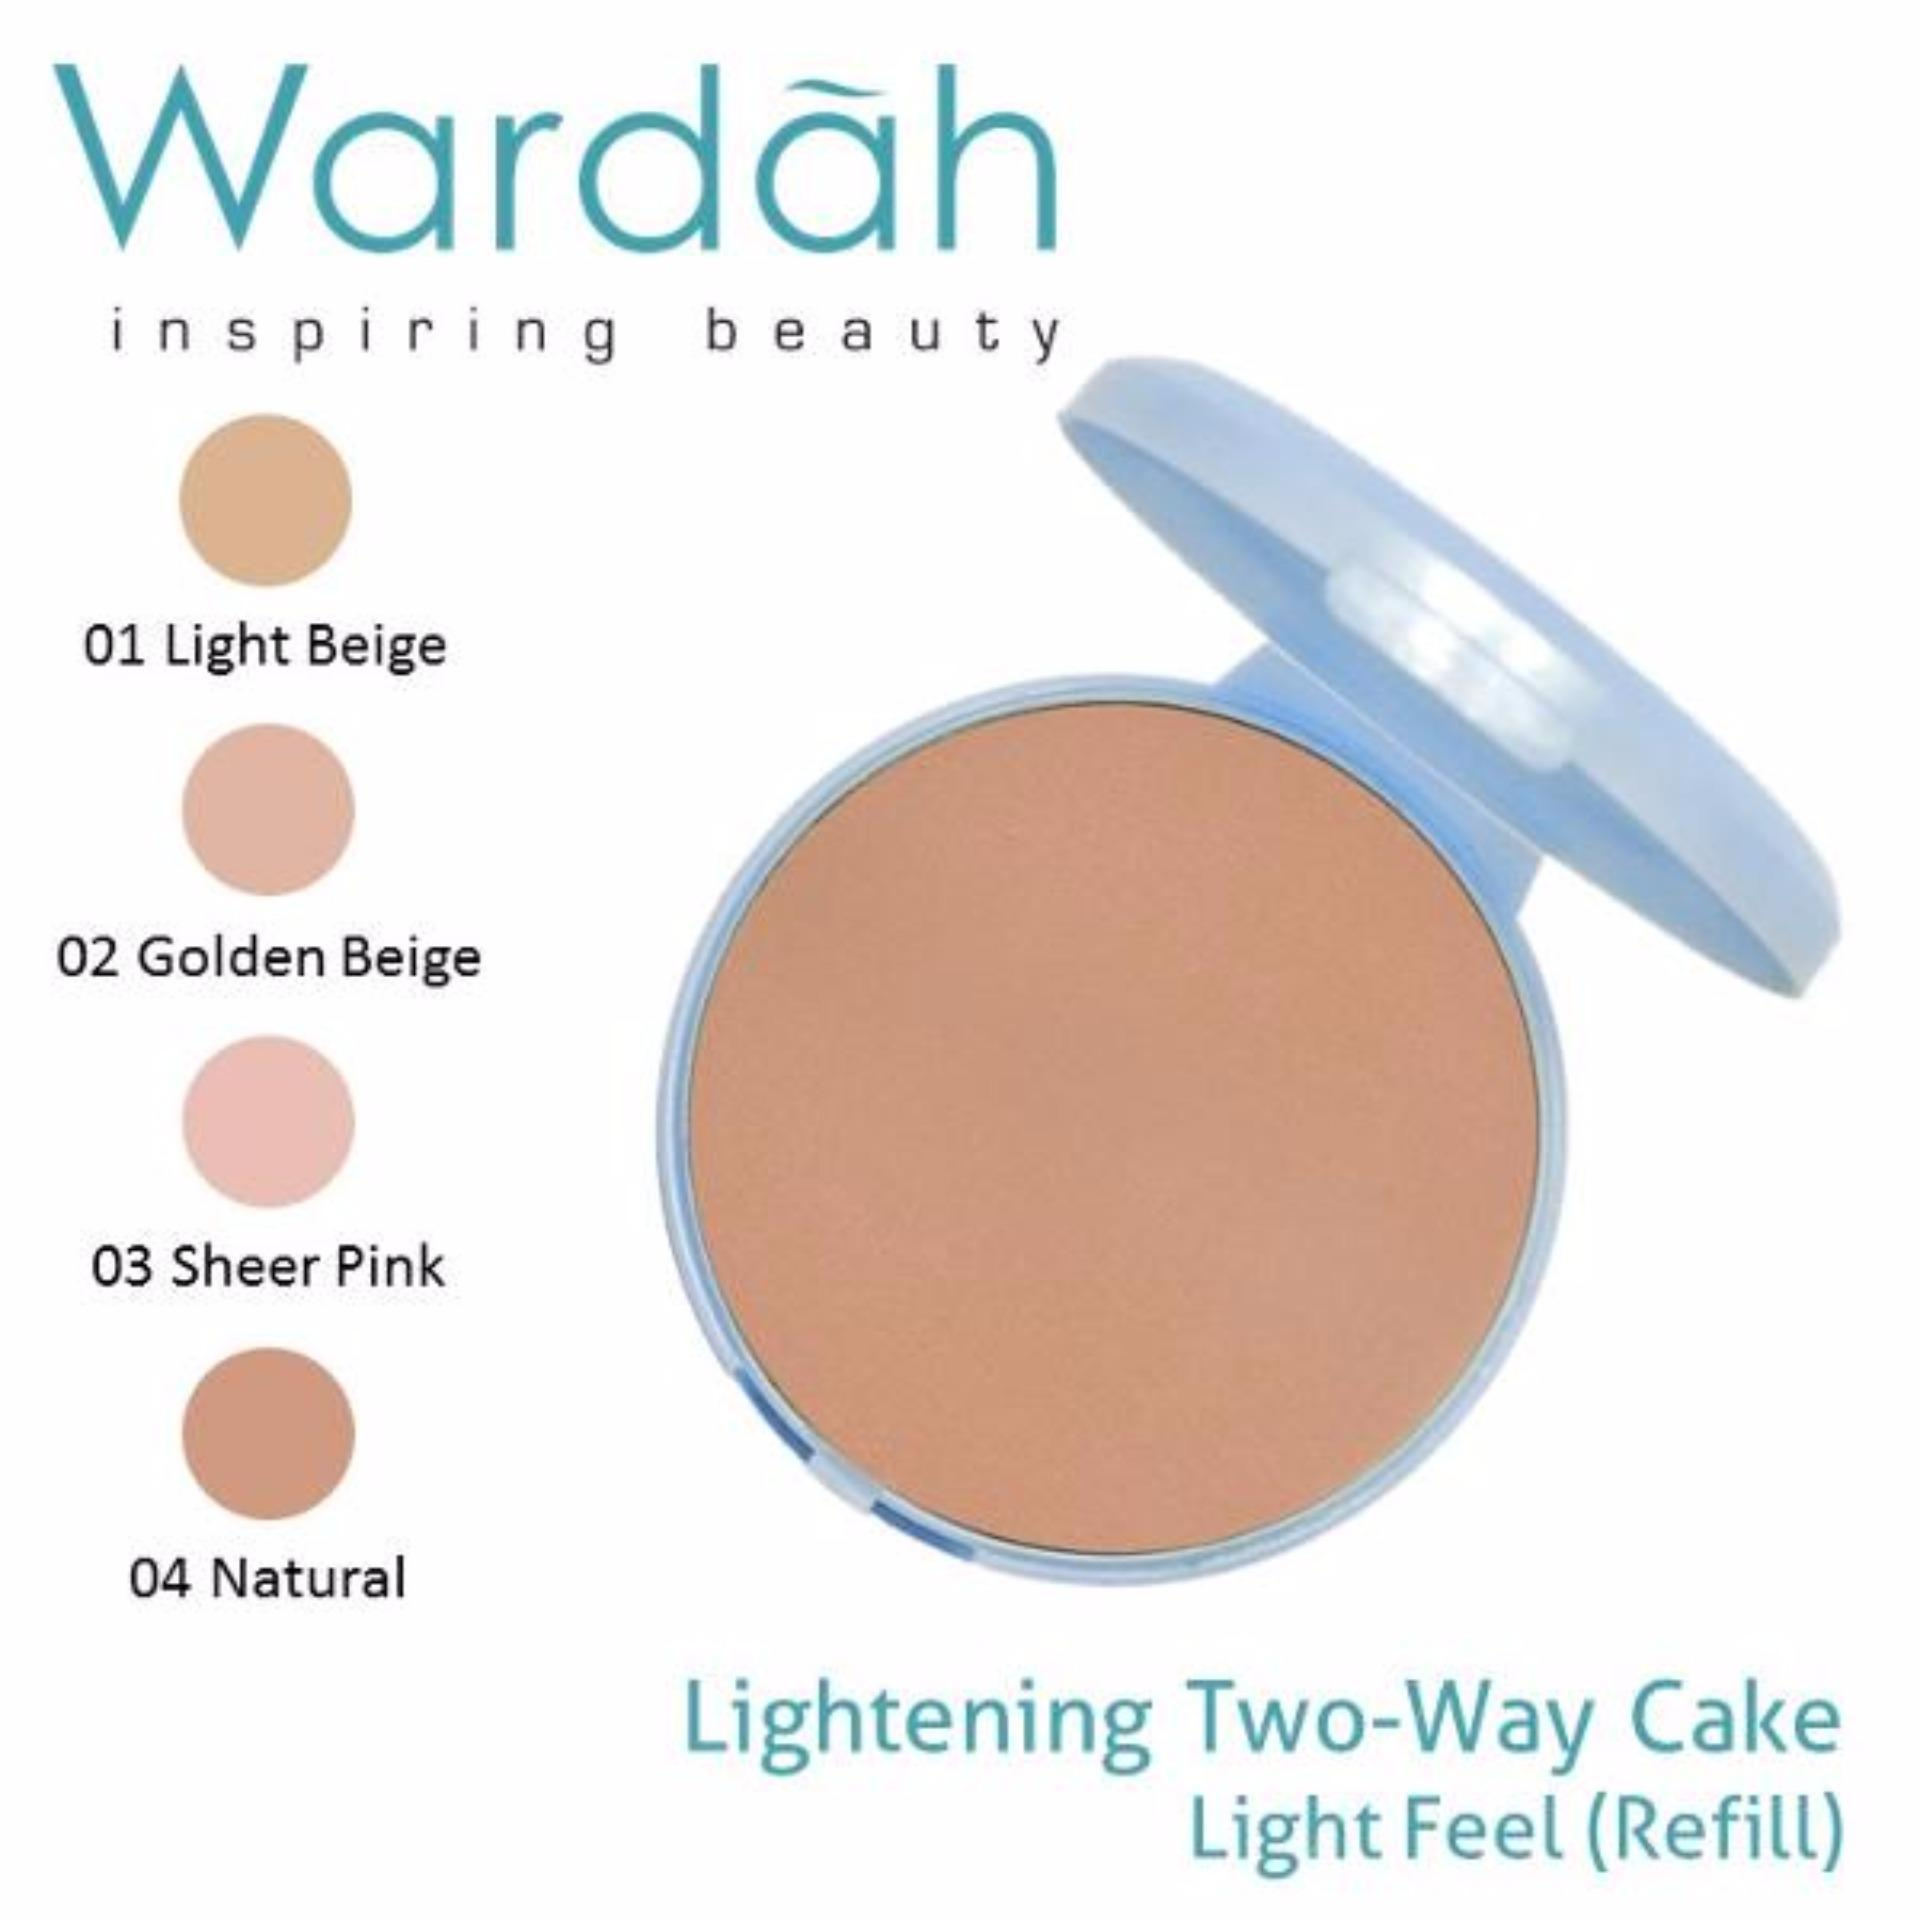 Kelebihan Wardah Exclusive Two Way Cake Refill Isi Ulang 04 Natural Warda Luminous Refil Lightening